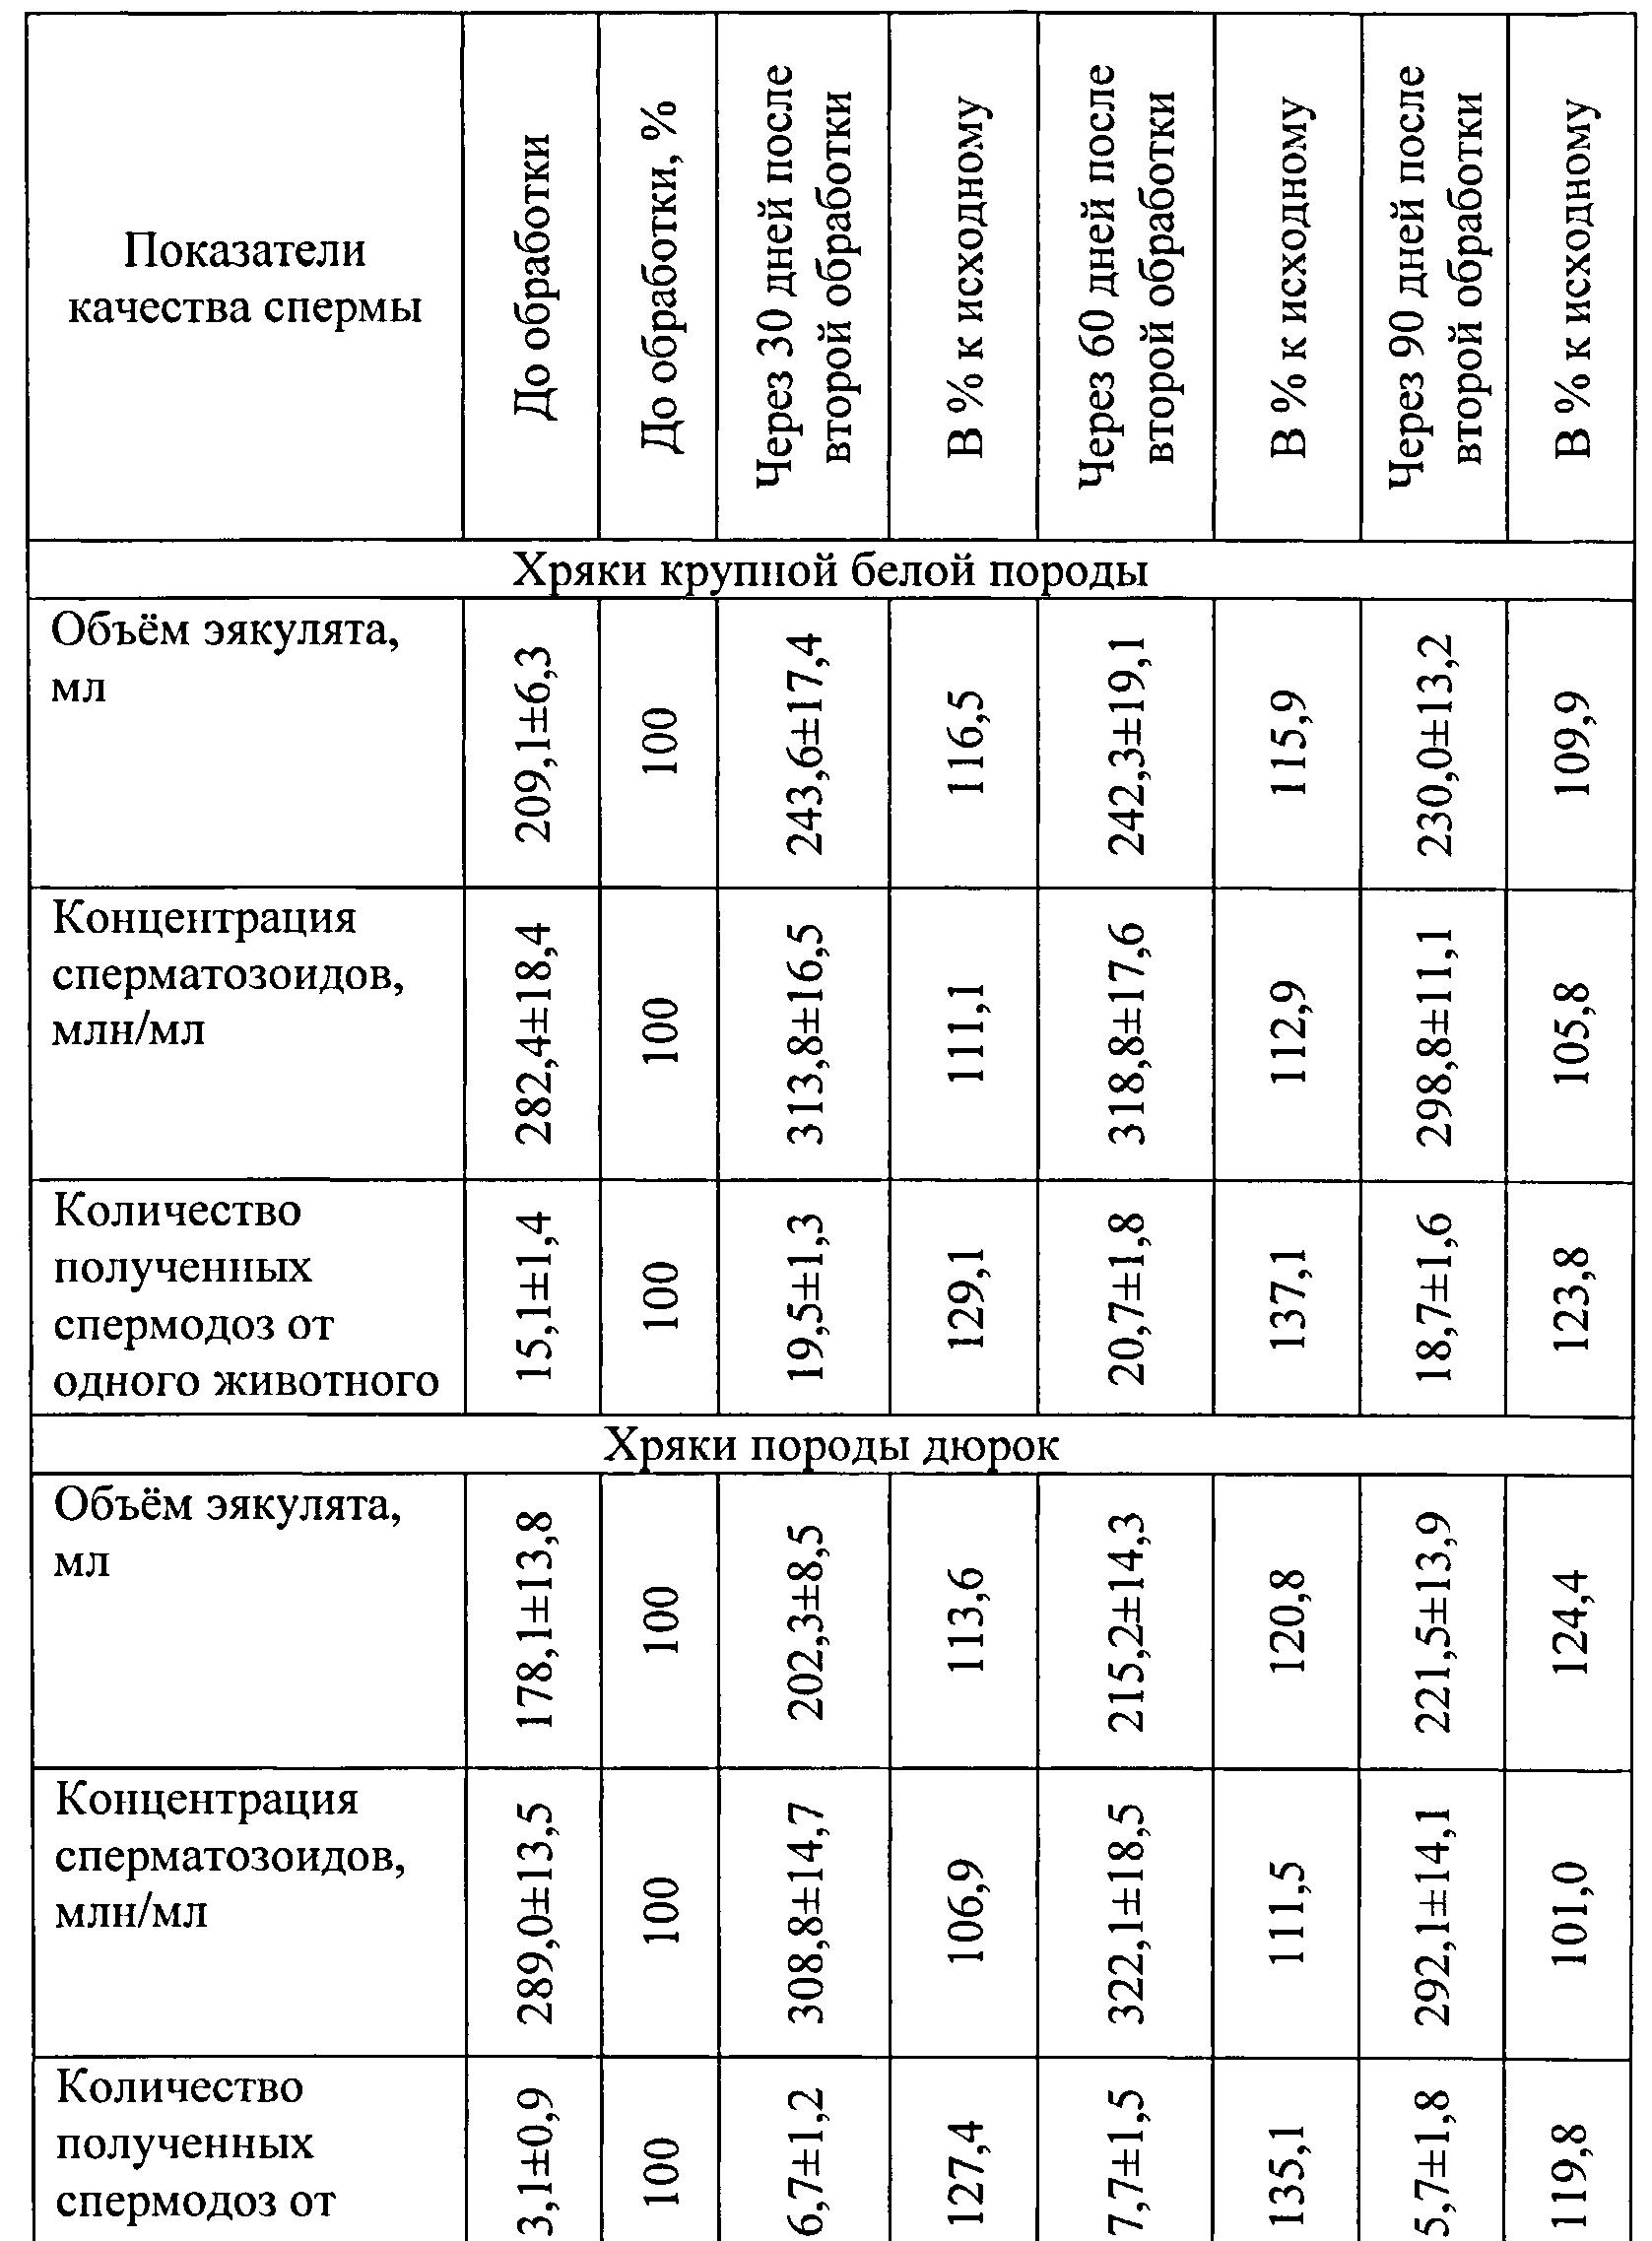 uvelichit-pokazateli-kontsentratsii-spermatozoidov